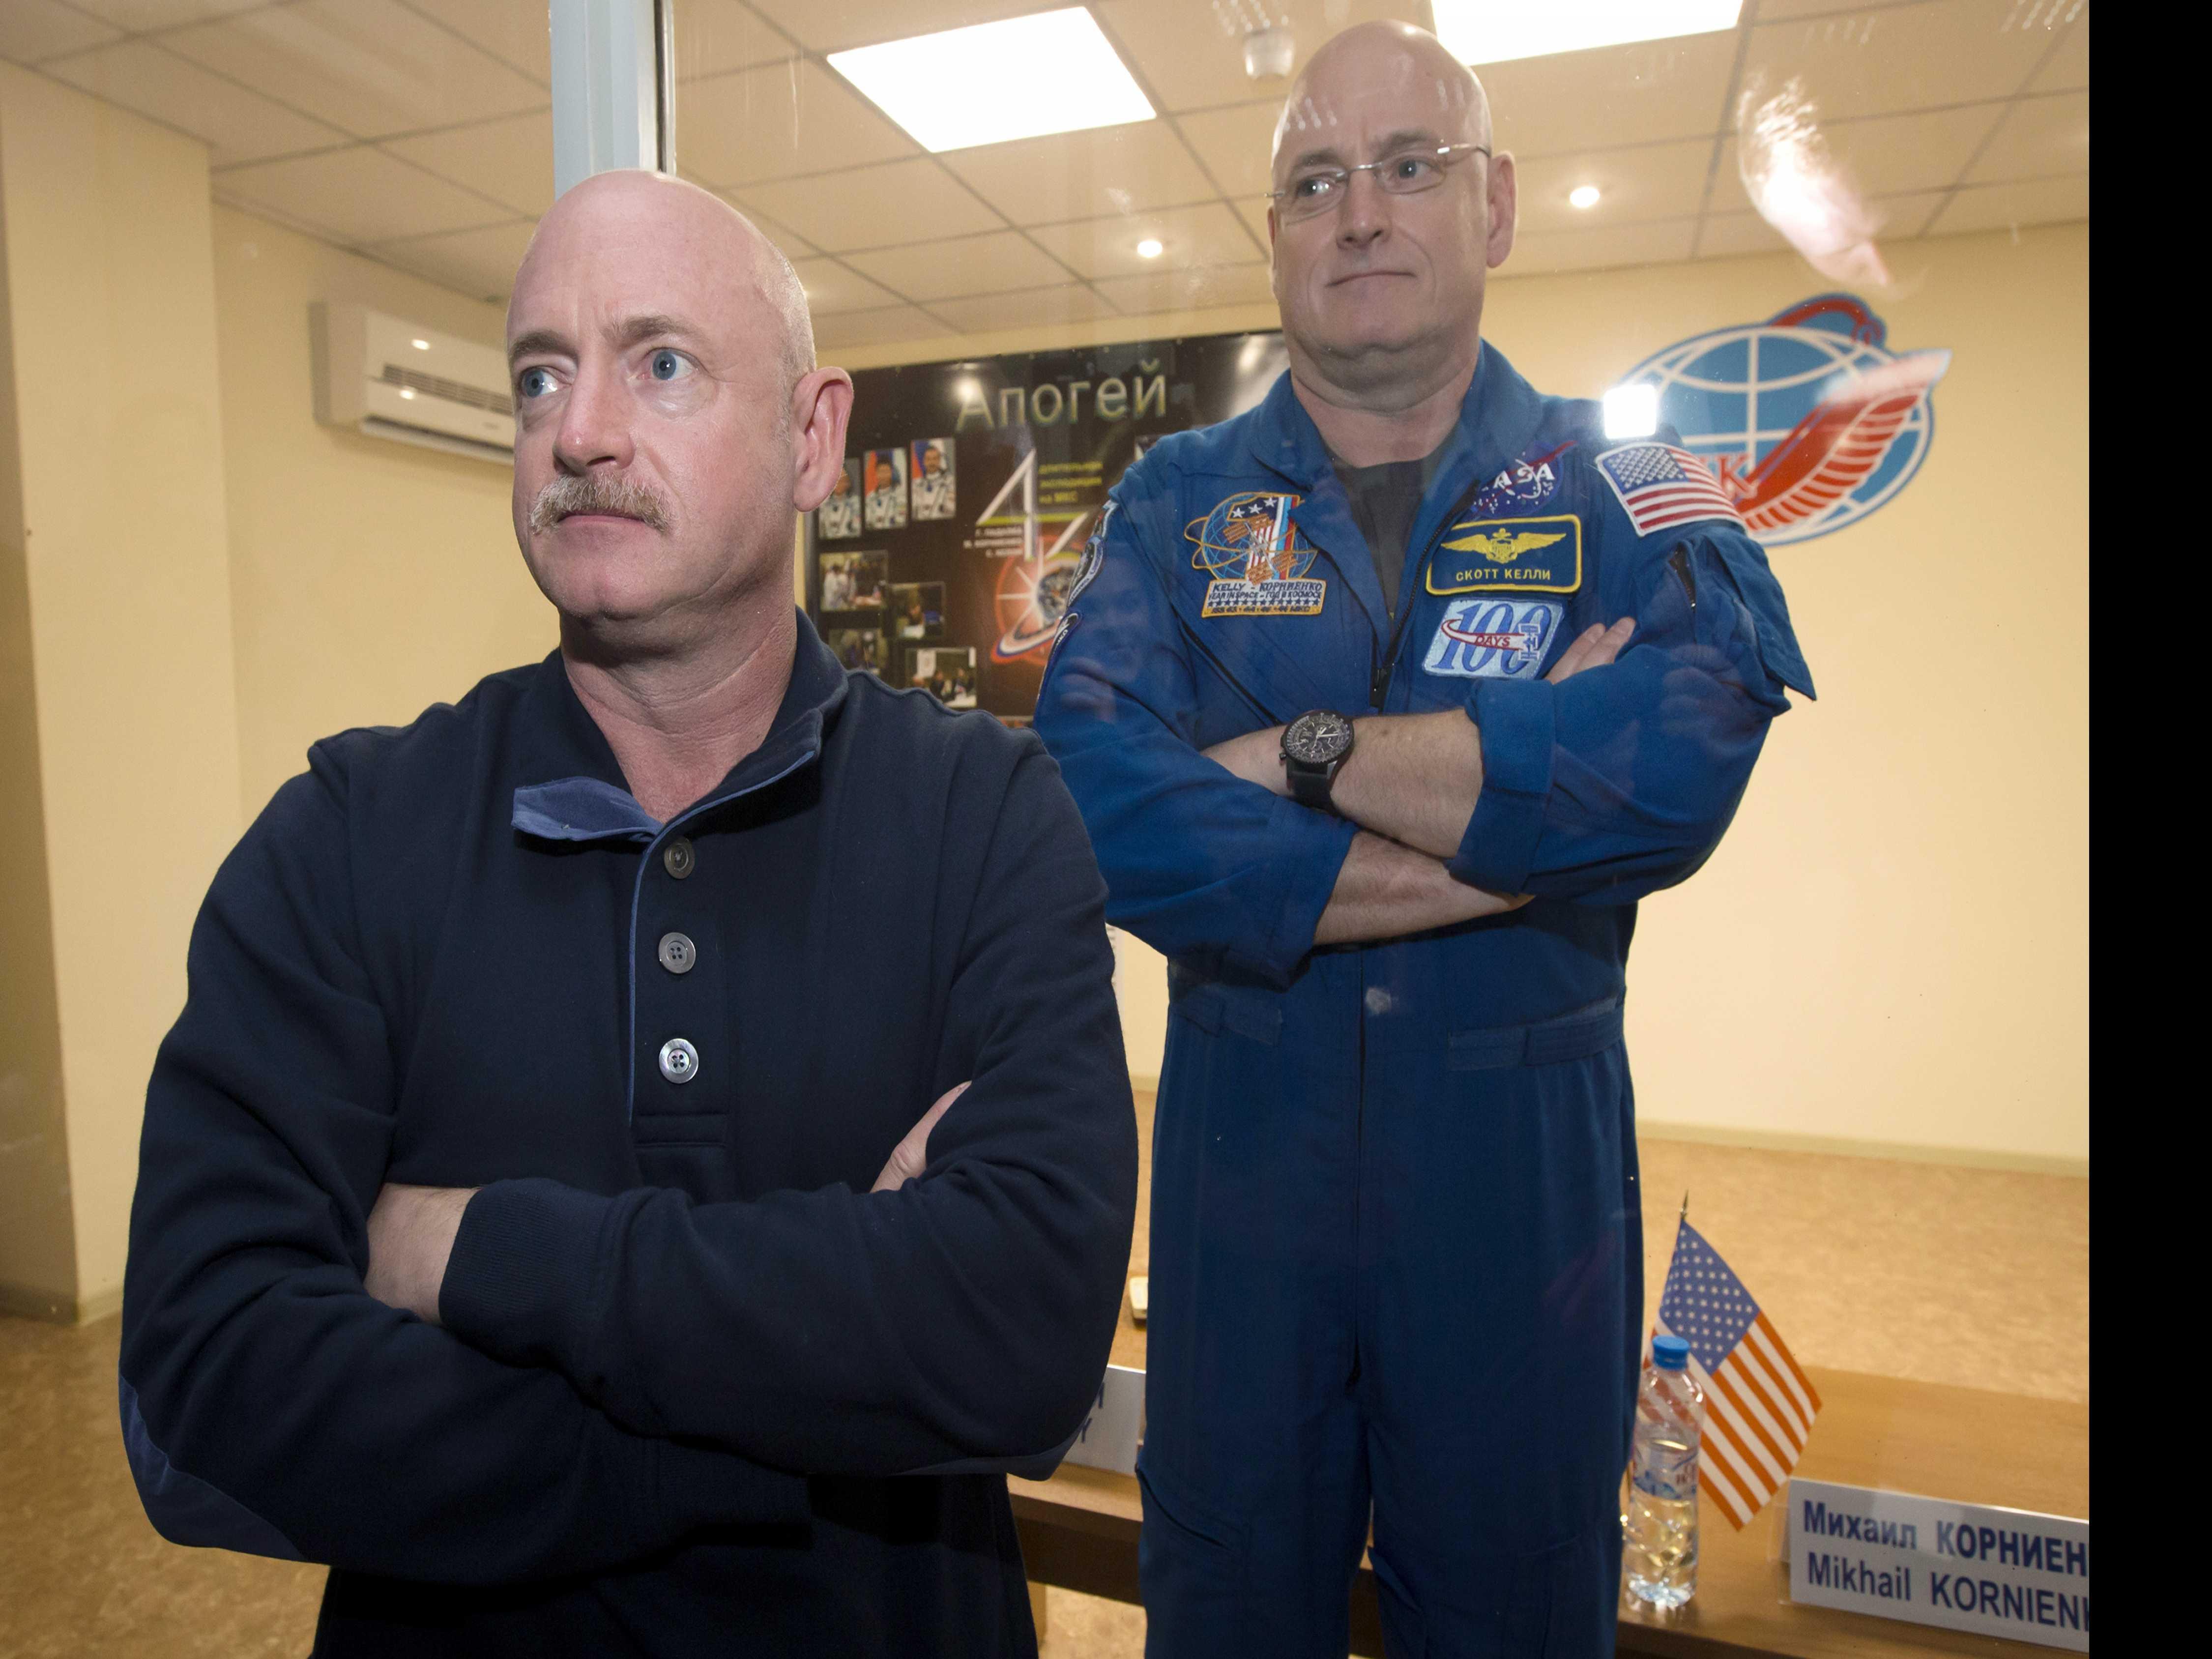 Year in Space Puts U.S. Astronaut's Disease Defenses on Alert